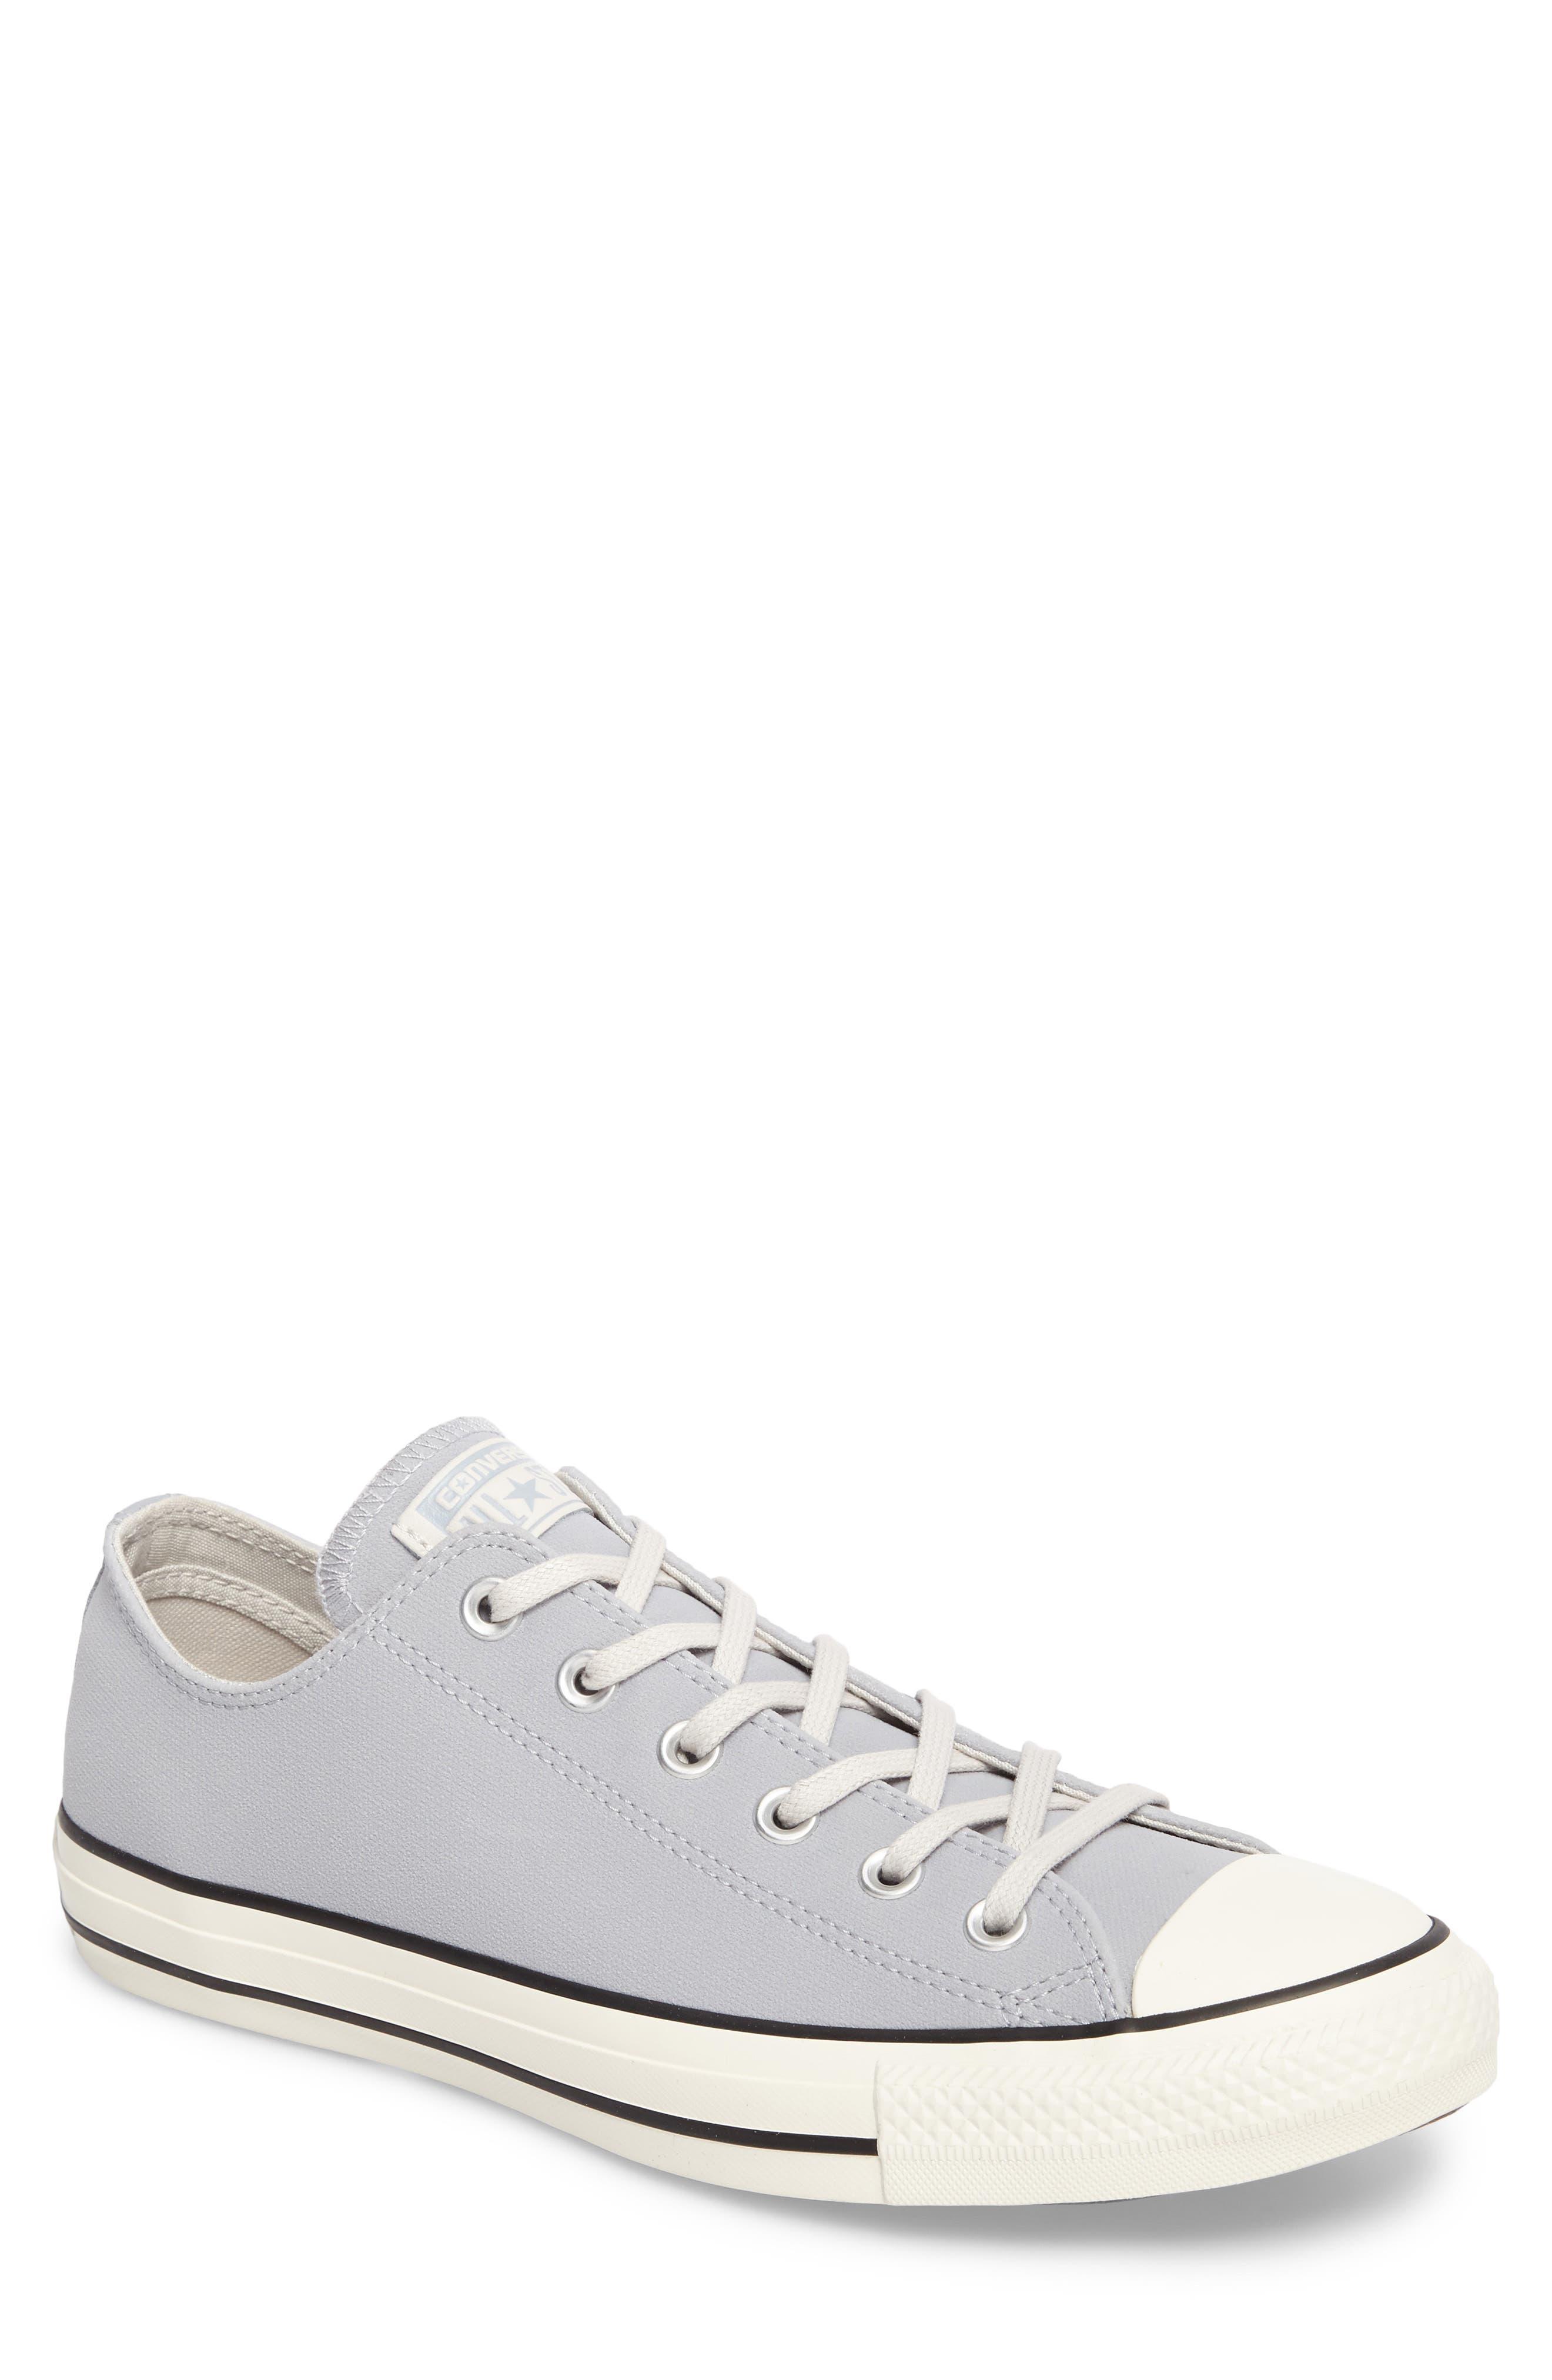 Chuck Taylor<sup>®</sup> All Star<sup>®</sup> Lo Sneaker,                             Main thumbnail 1, color,                             Wolf Grey